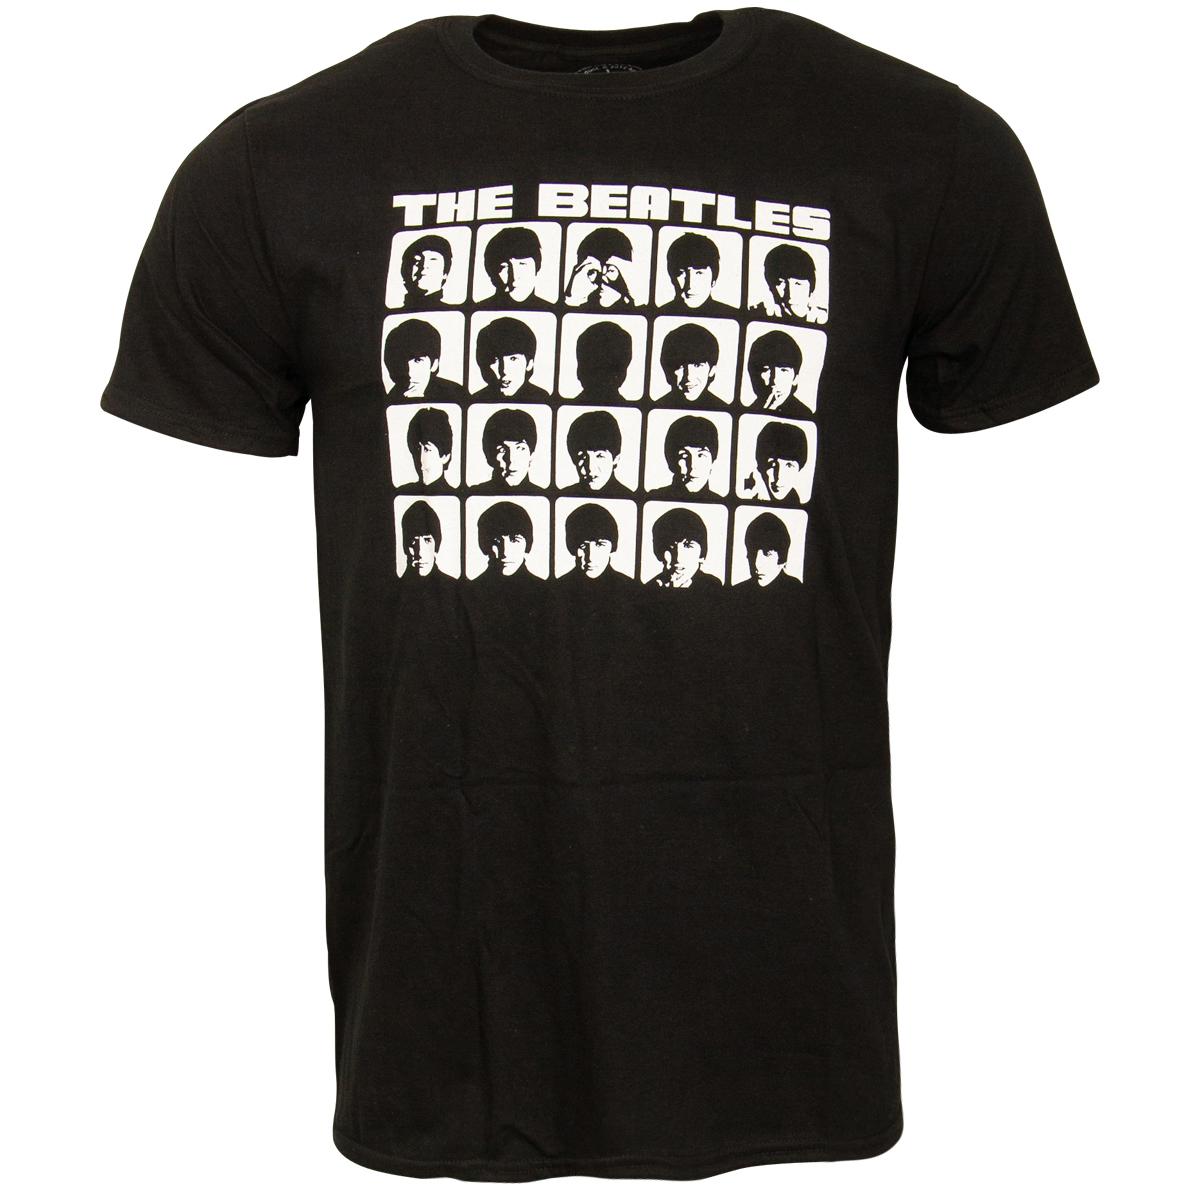 The Beatles - T-Shirt Hard Days Night Faces Mono - schwarz